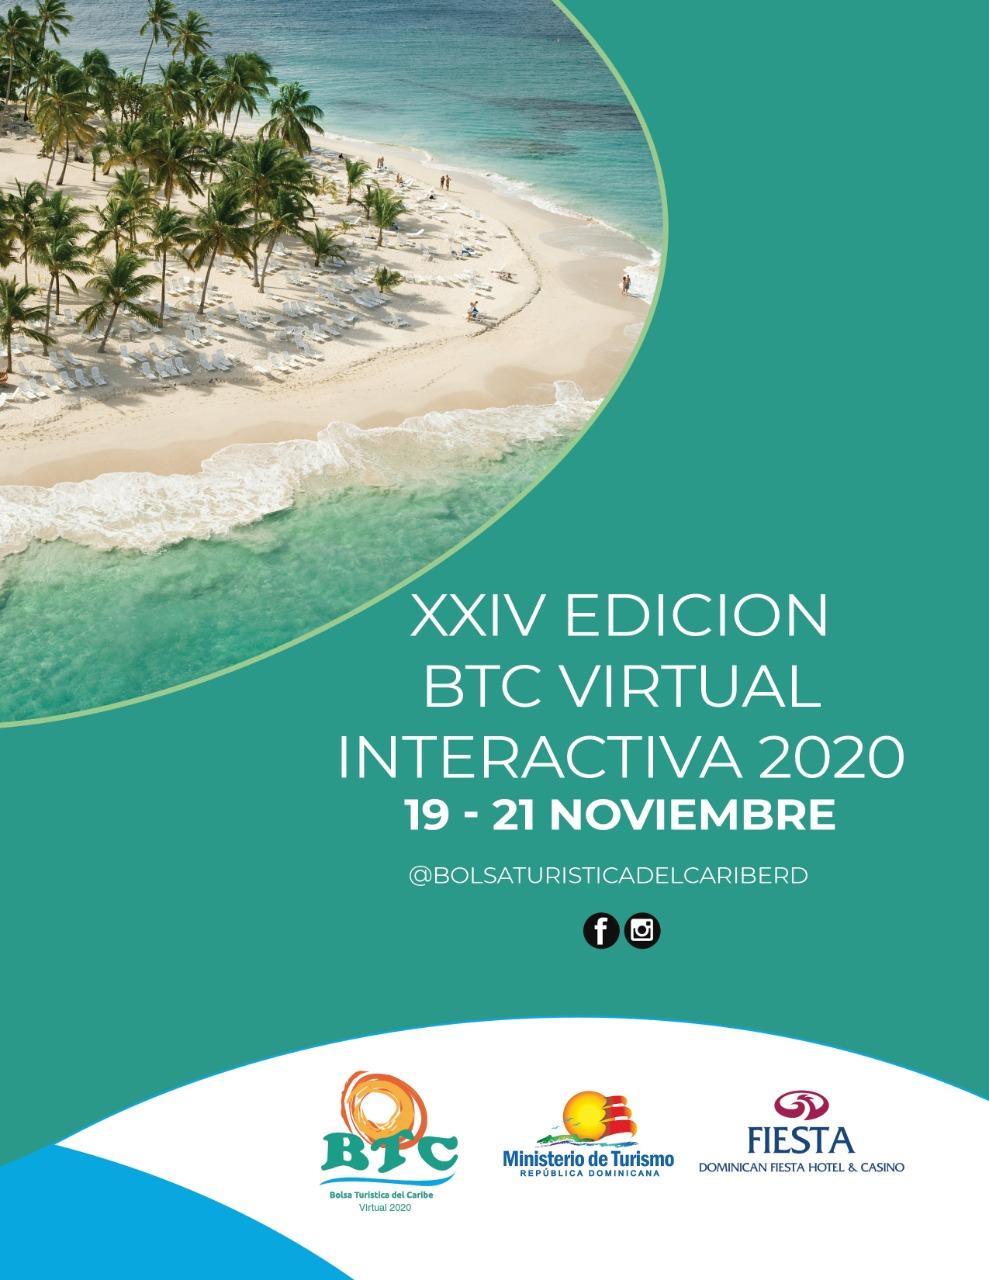 Business Travel Consulting Btc Srl actuala Uvet Viaggi Turismo Srl